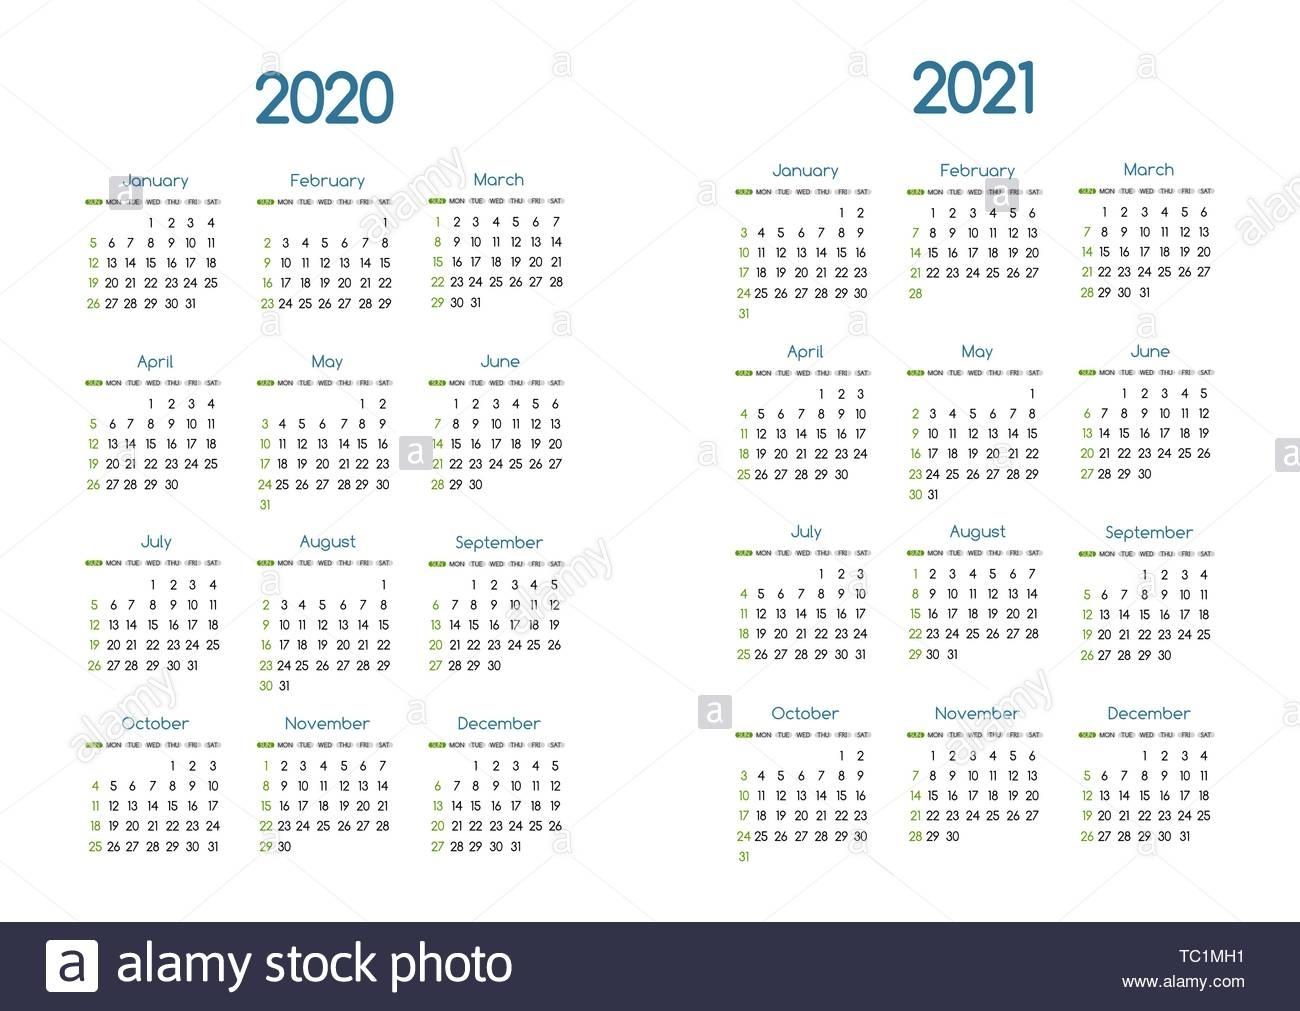 Calendario Juliano 2020 - Fora.educateidaho